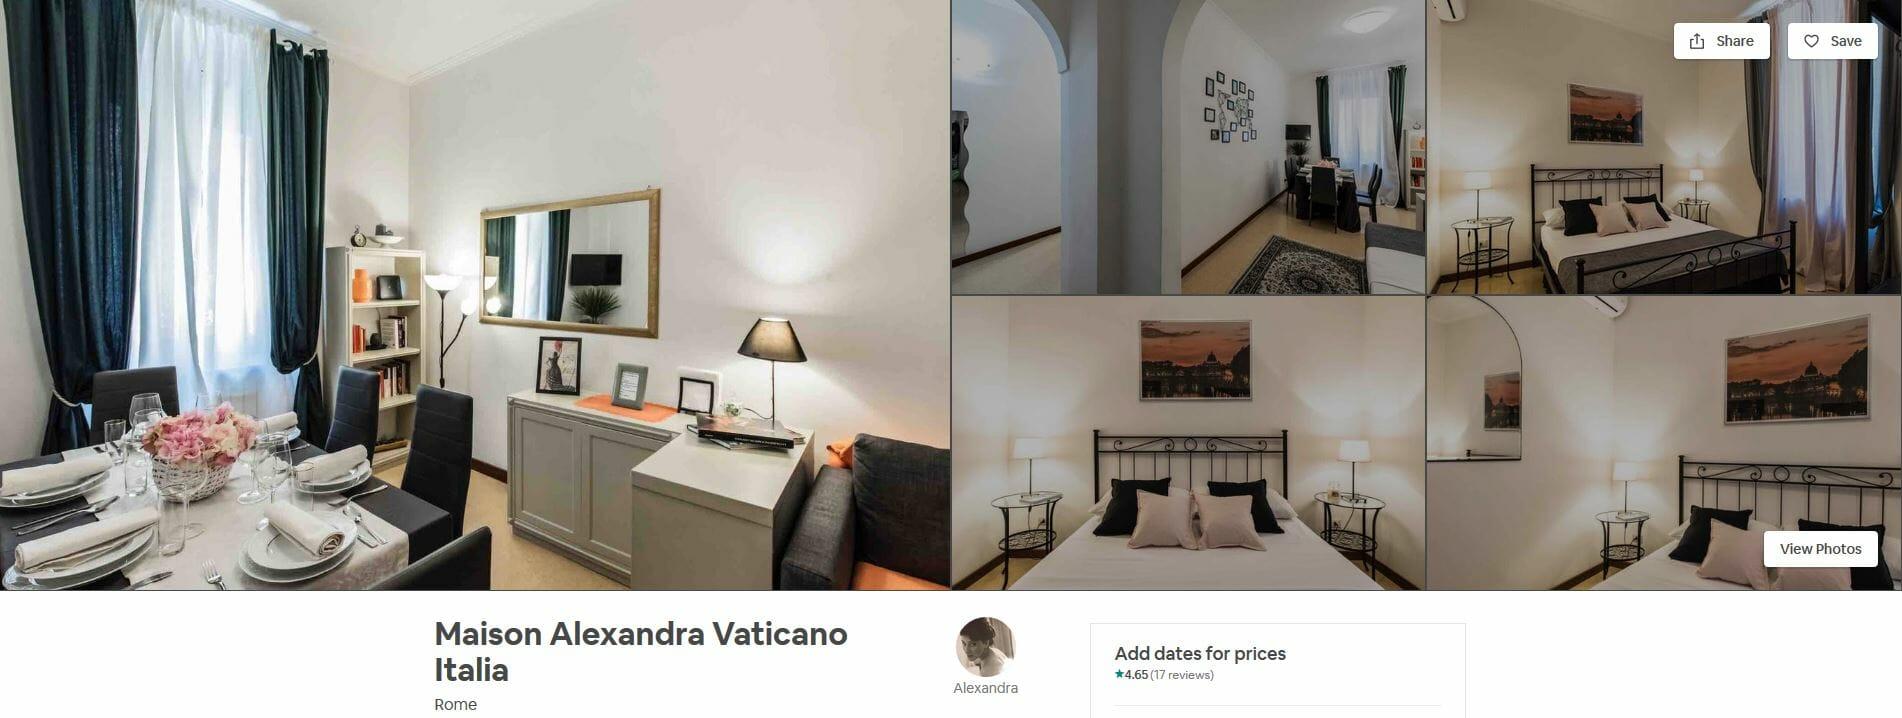 best airbnbs rome Maison Alexandra Vaticano